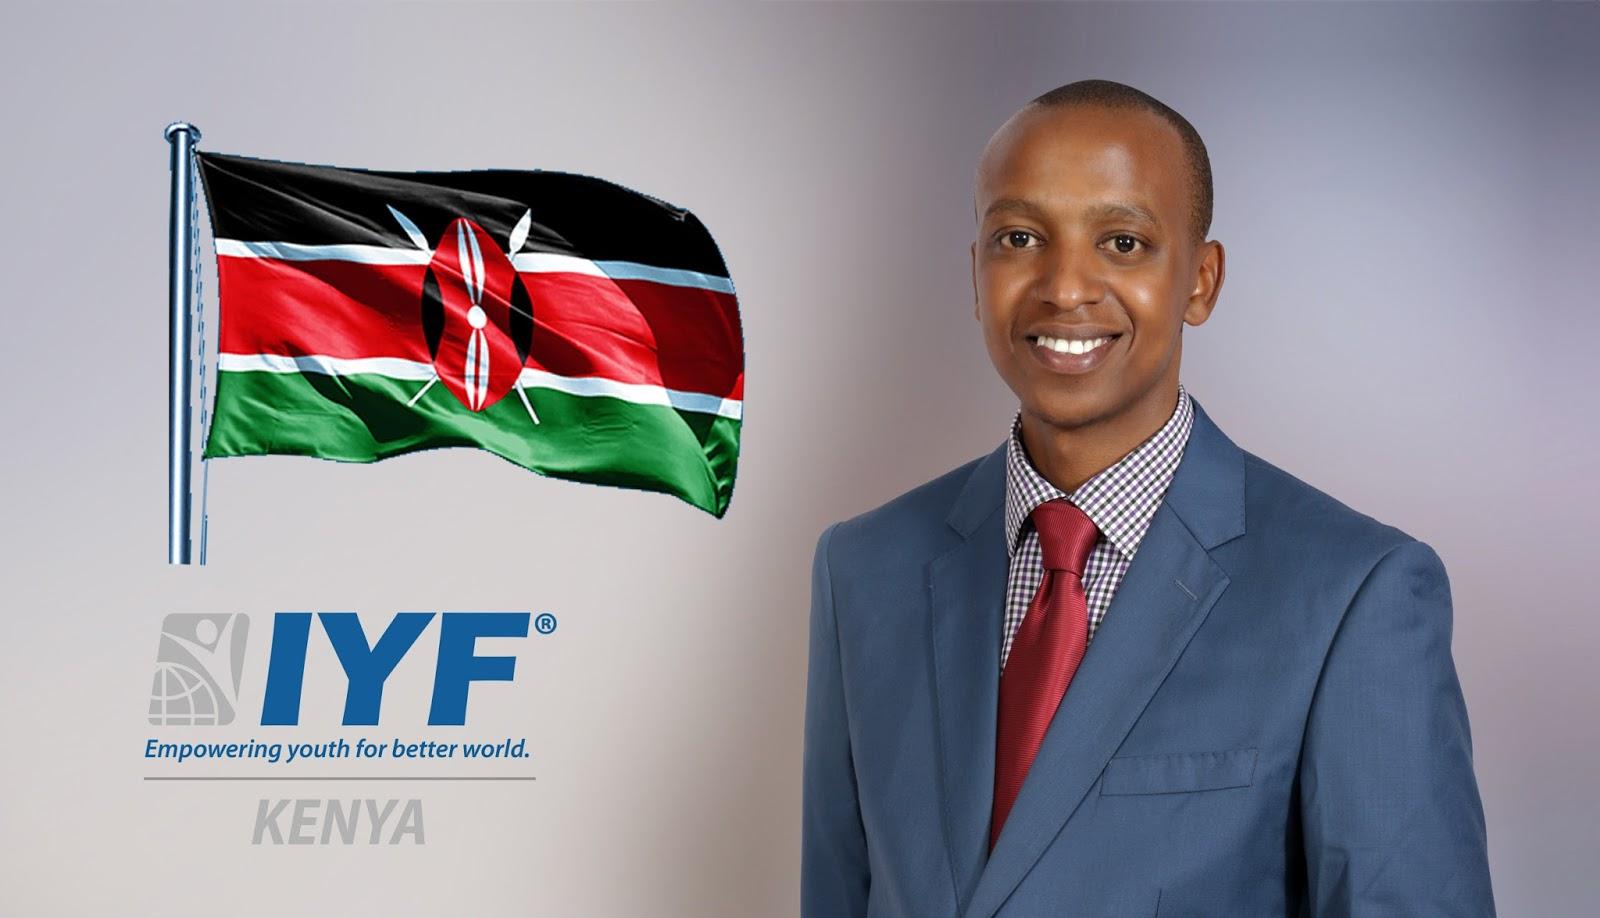 Mwaura Kimani, IYF Representative in Kenya